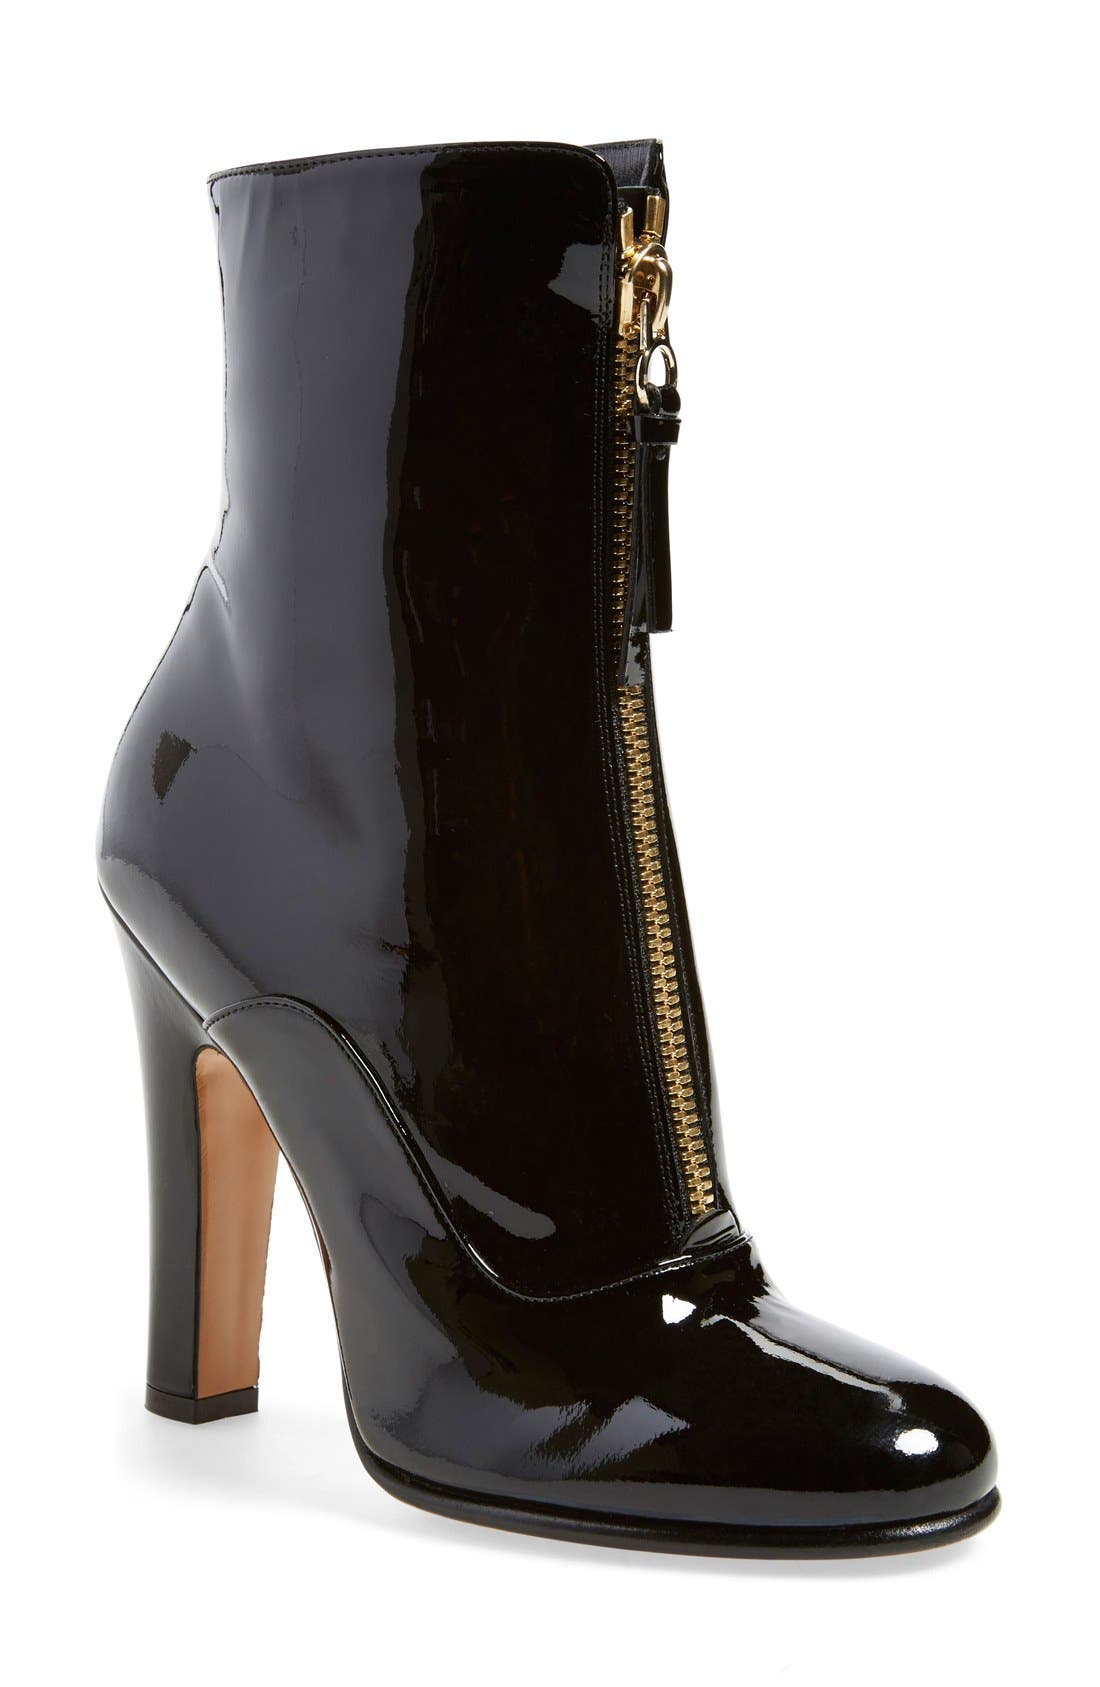 Alternate Image 1 Selected - Valentino 'Rebelle' Round Toe Zip Bootie (Women)